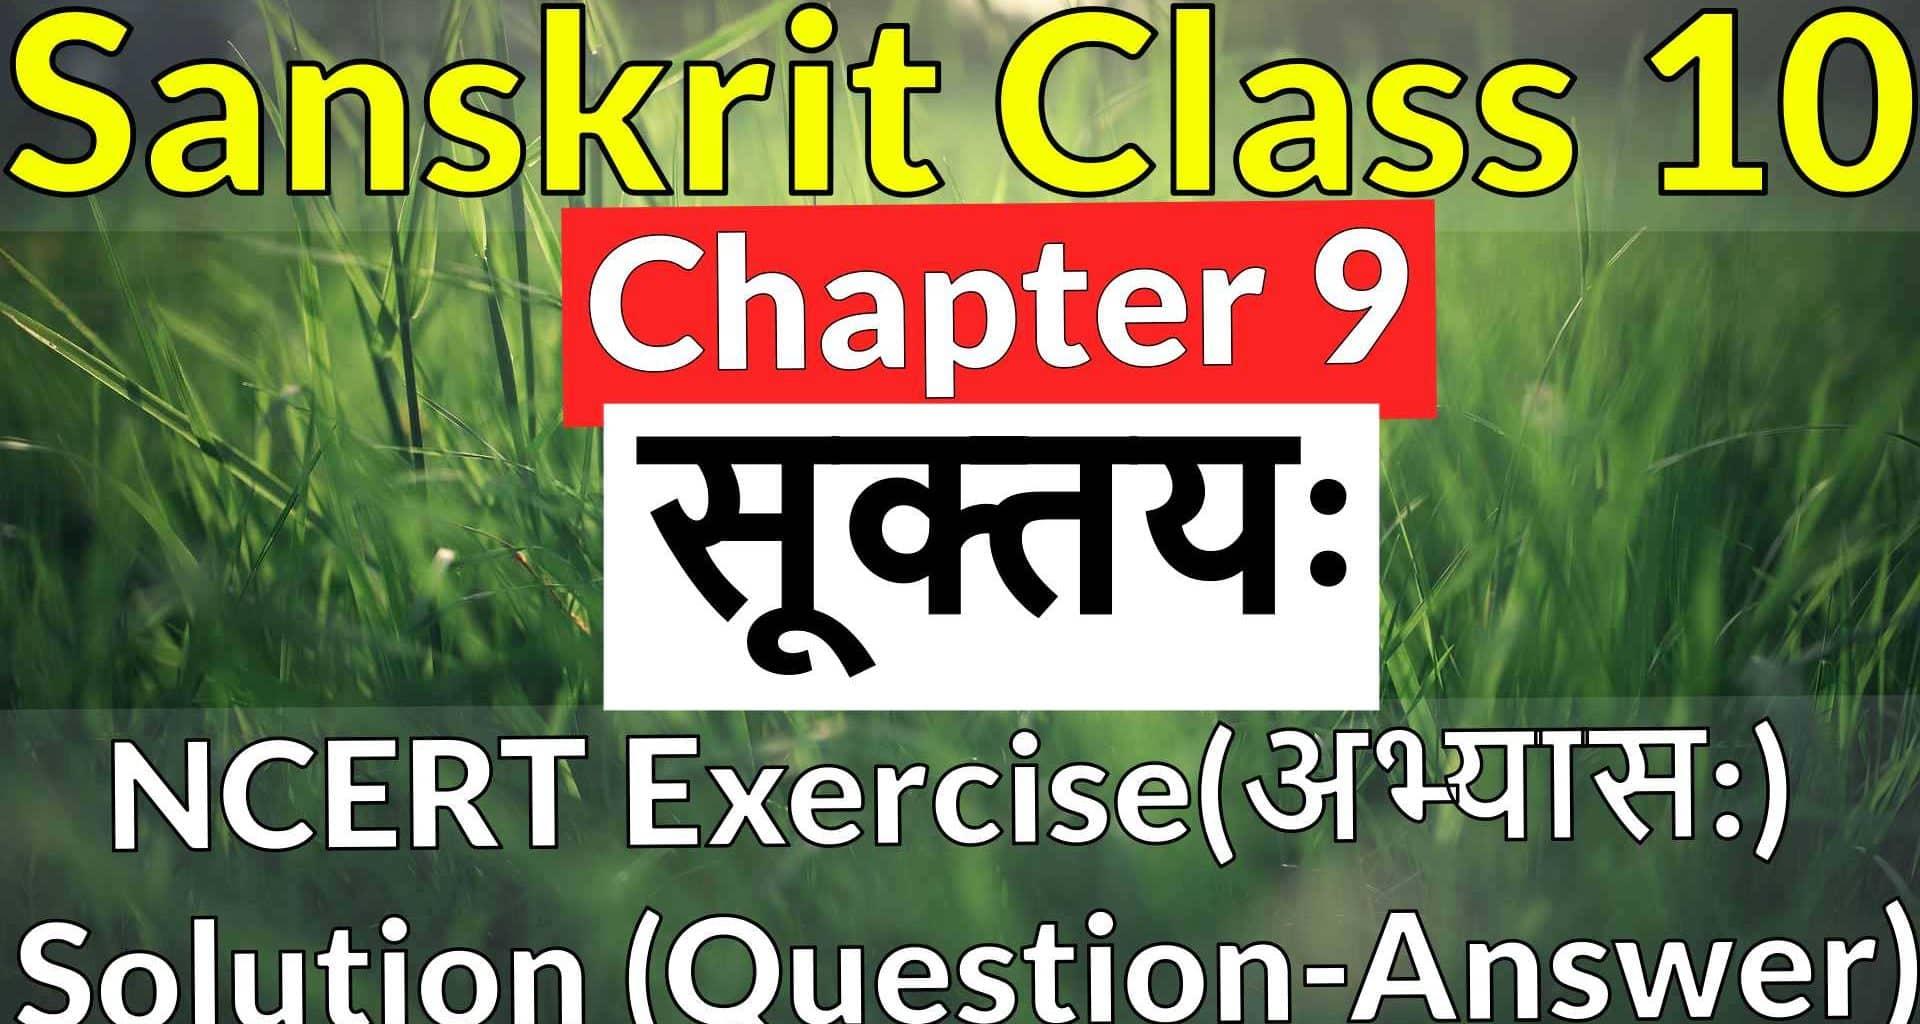 Sanskrit Class 10 - Chapter 9 - सूक्तयः - NCERT Exercise Solution (Question-Answer)